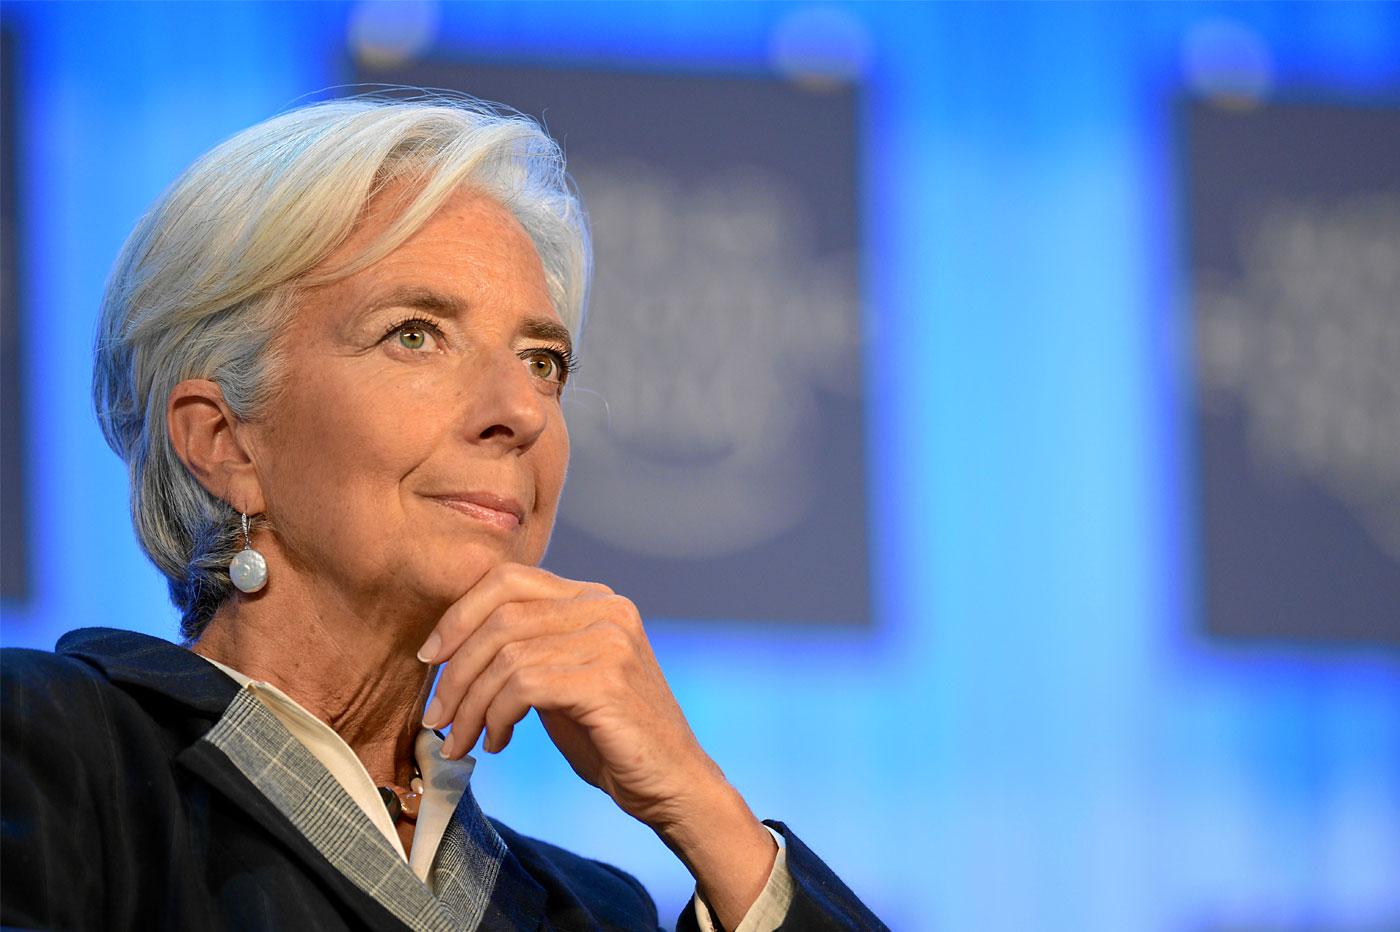 FMI et les crypto-monnaies